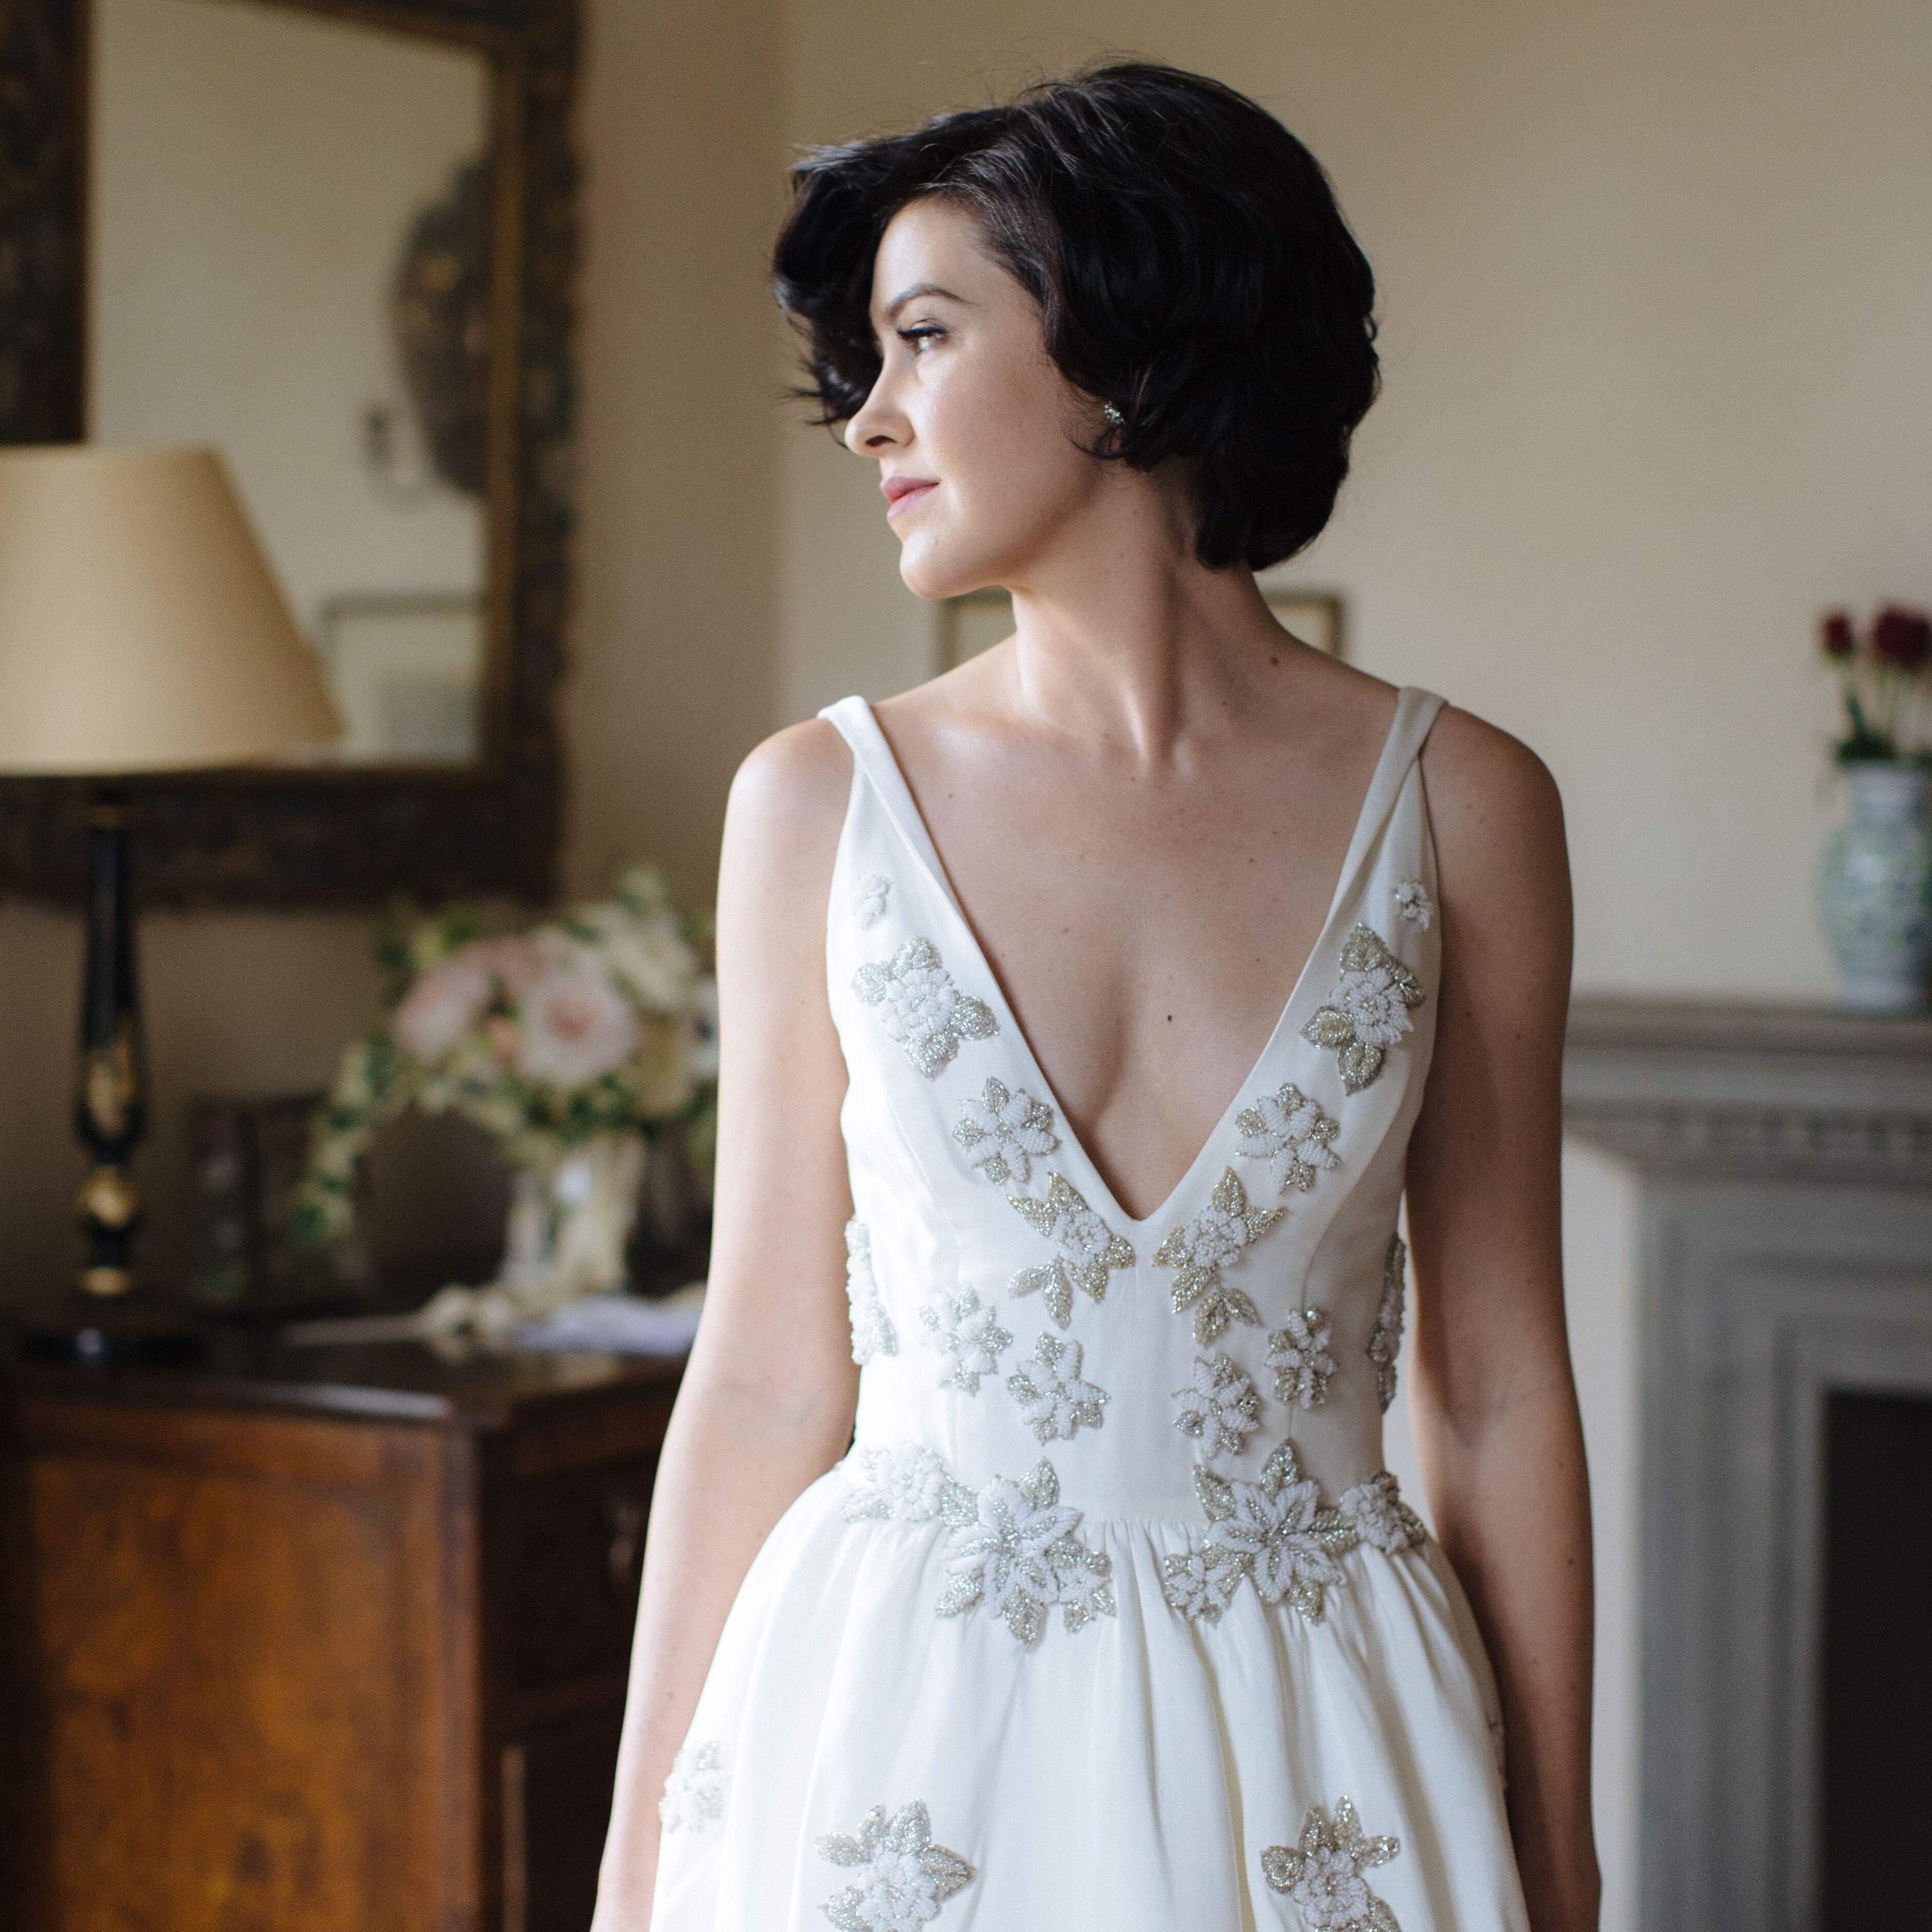 12 Wedding Hairstyles for Short Hair